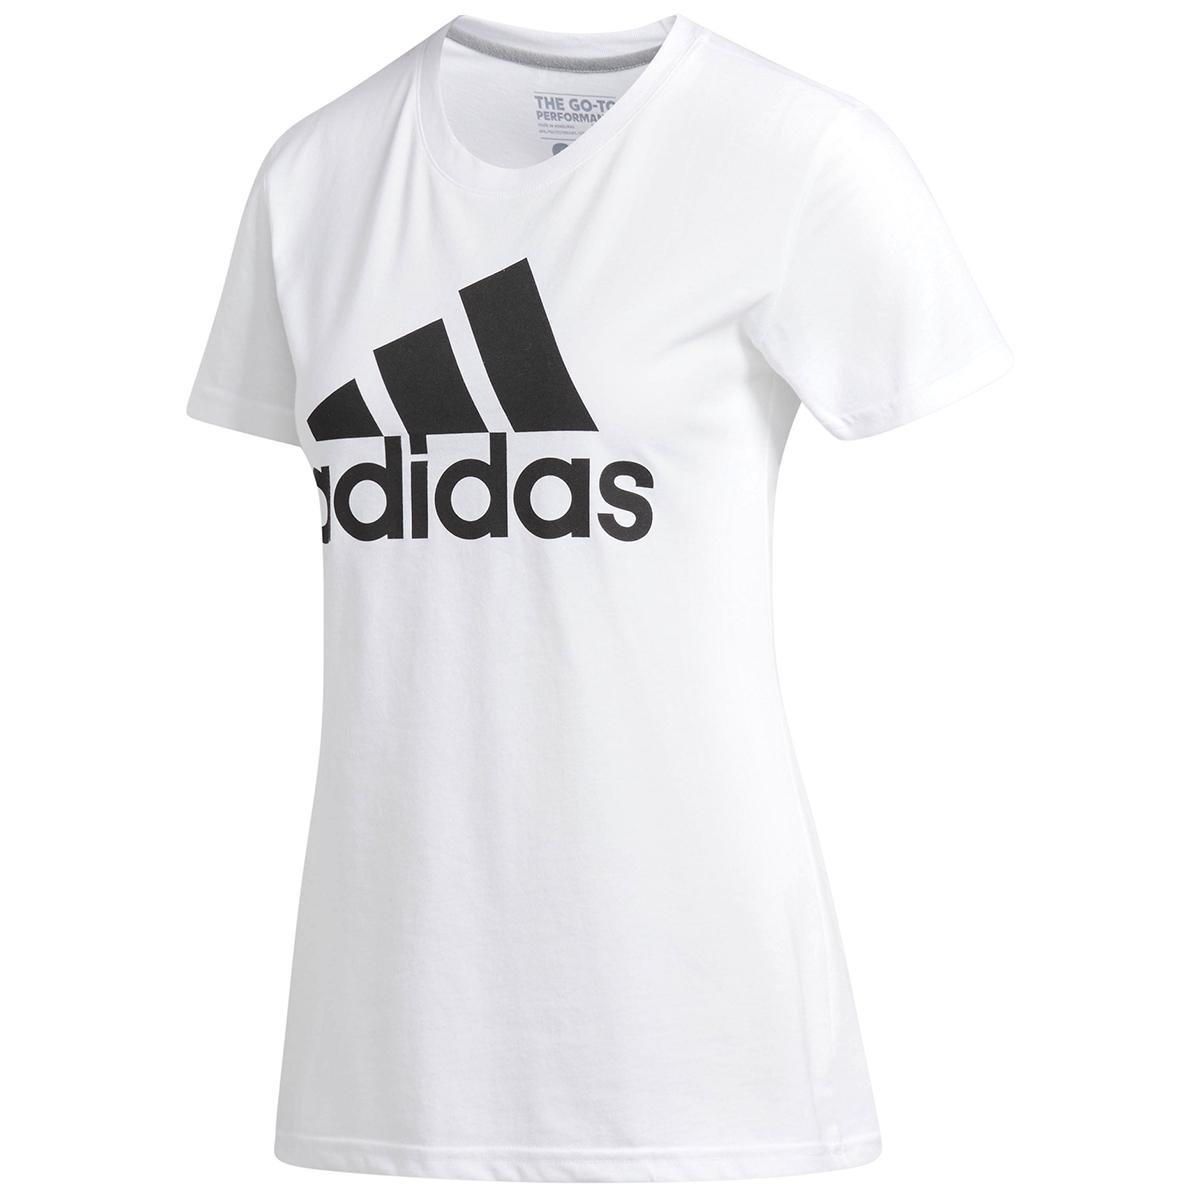 Adidas Women's Badge Of Sport Classic Short-Sleeve Tee - White, S